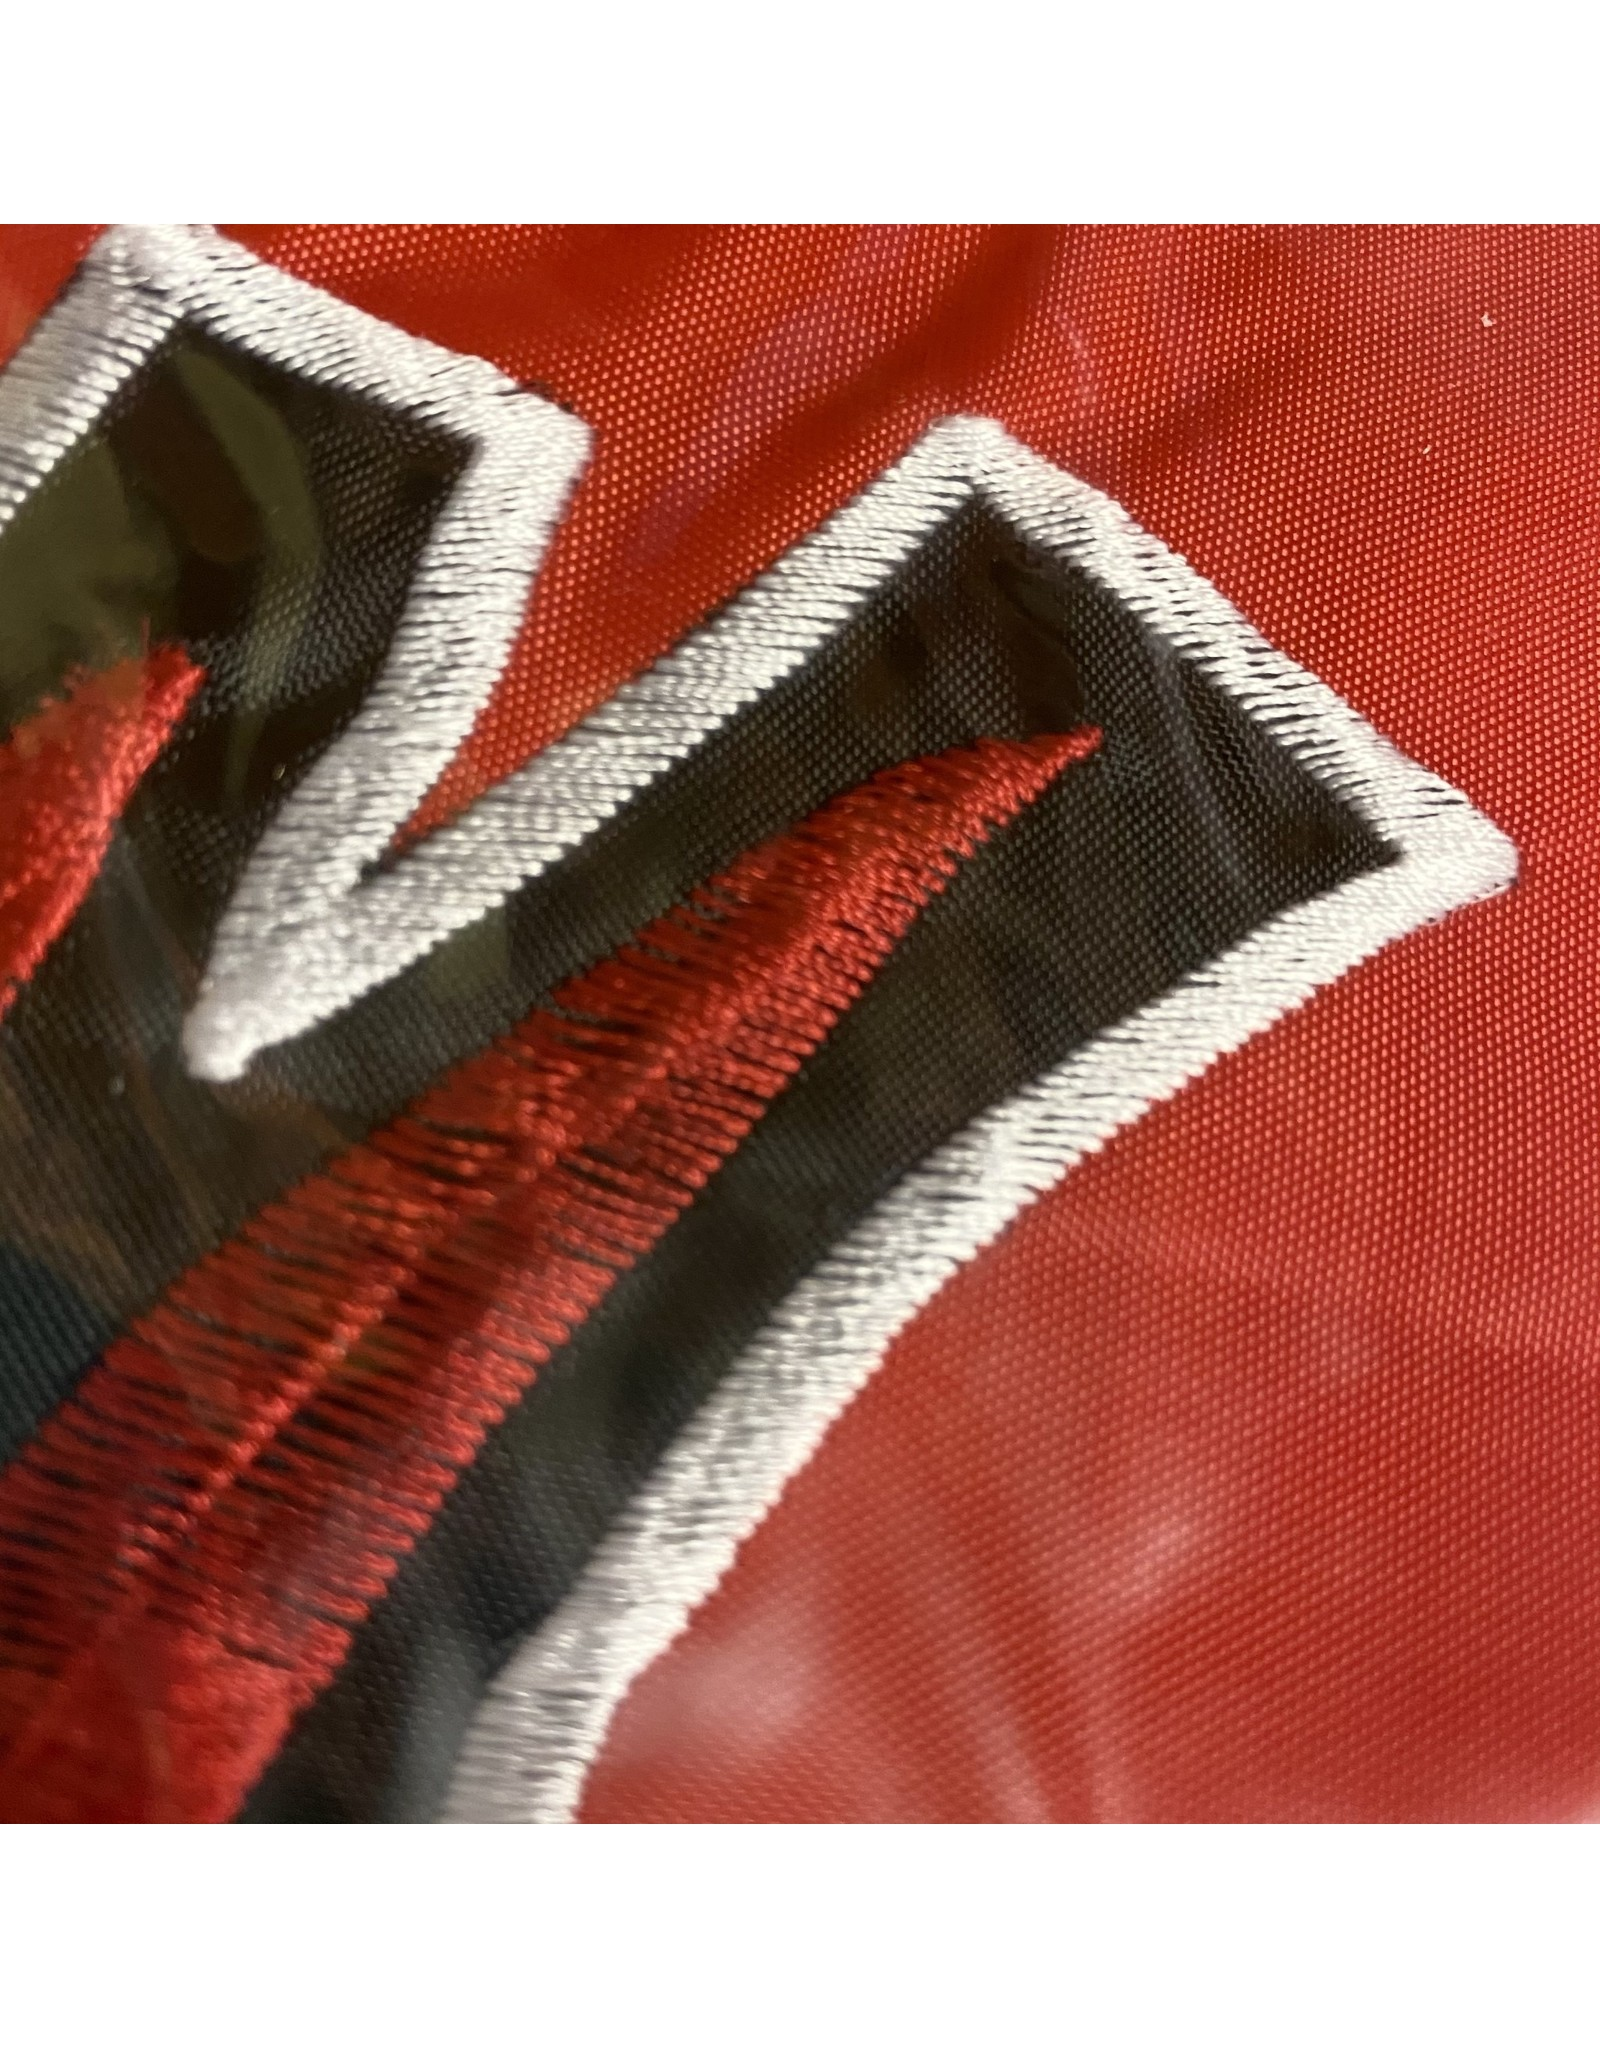 UBF Flag - 3x5 NyloMax House Flag